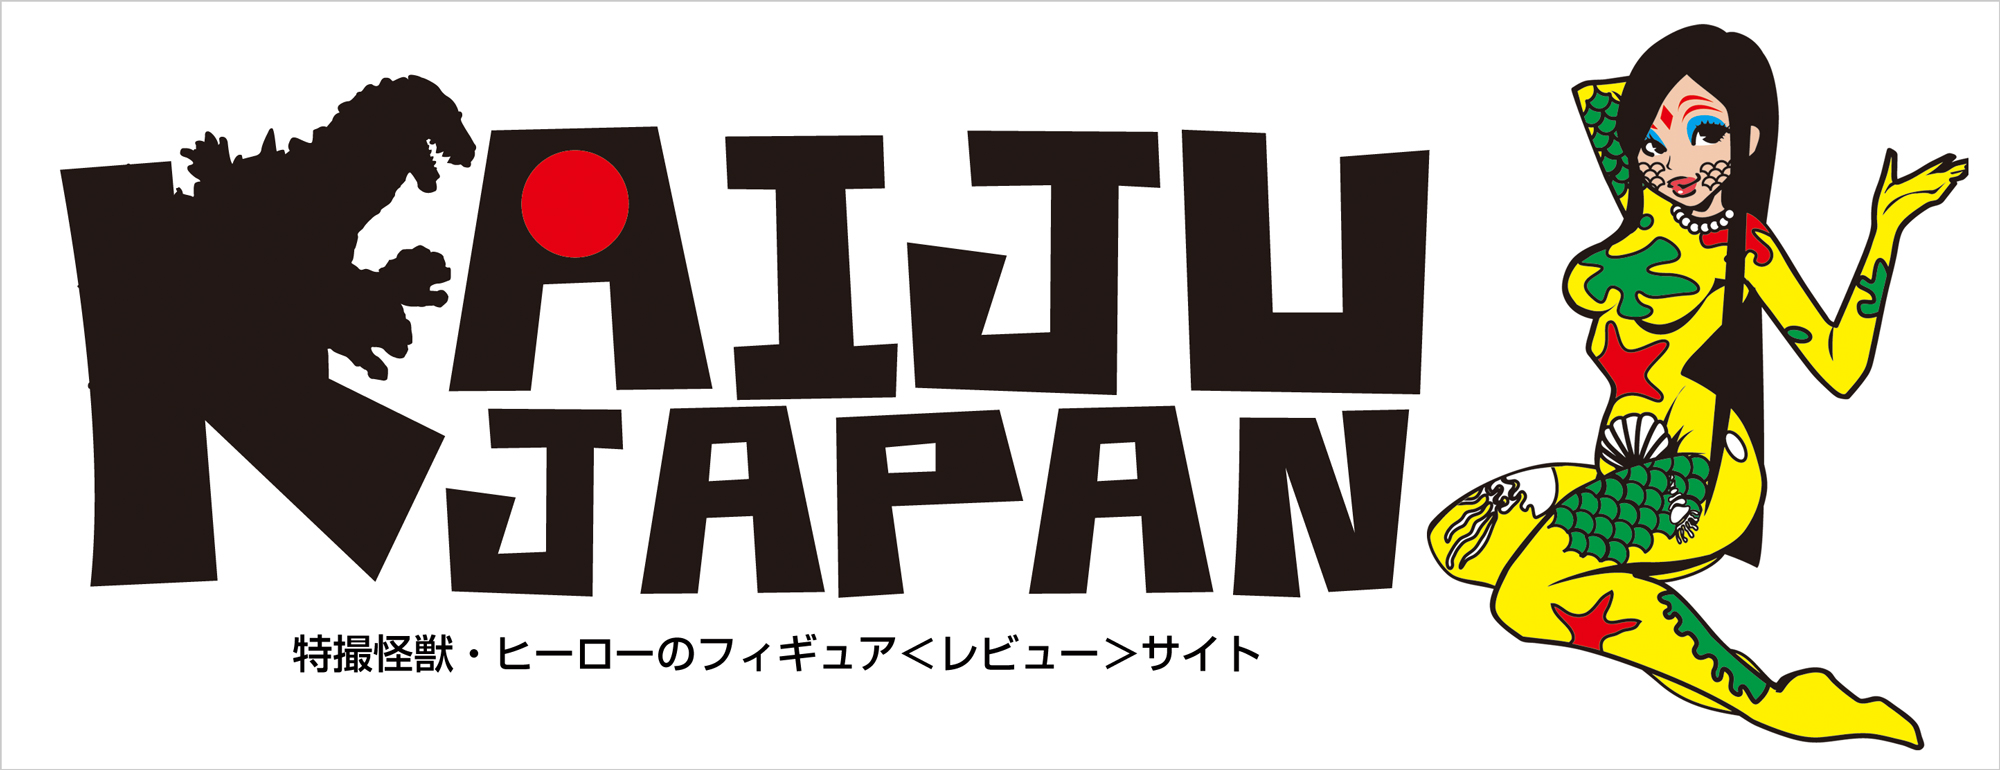 kaijujapan-banner.jpg